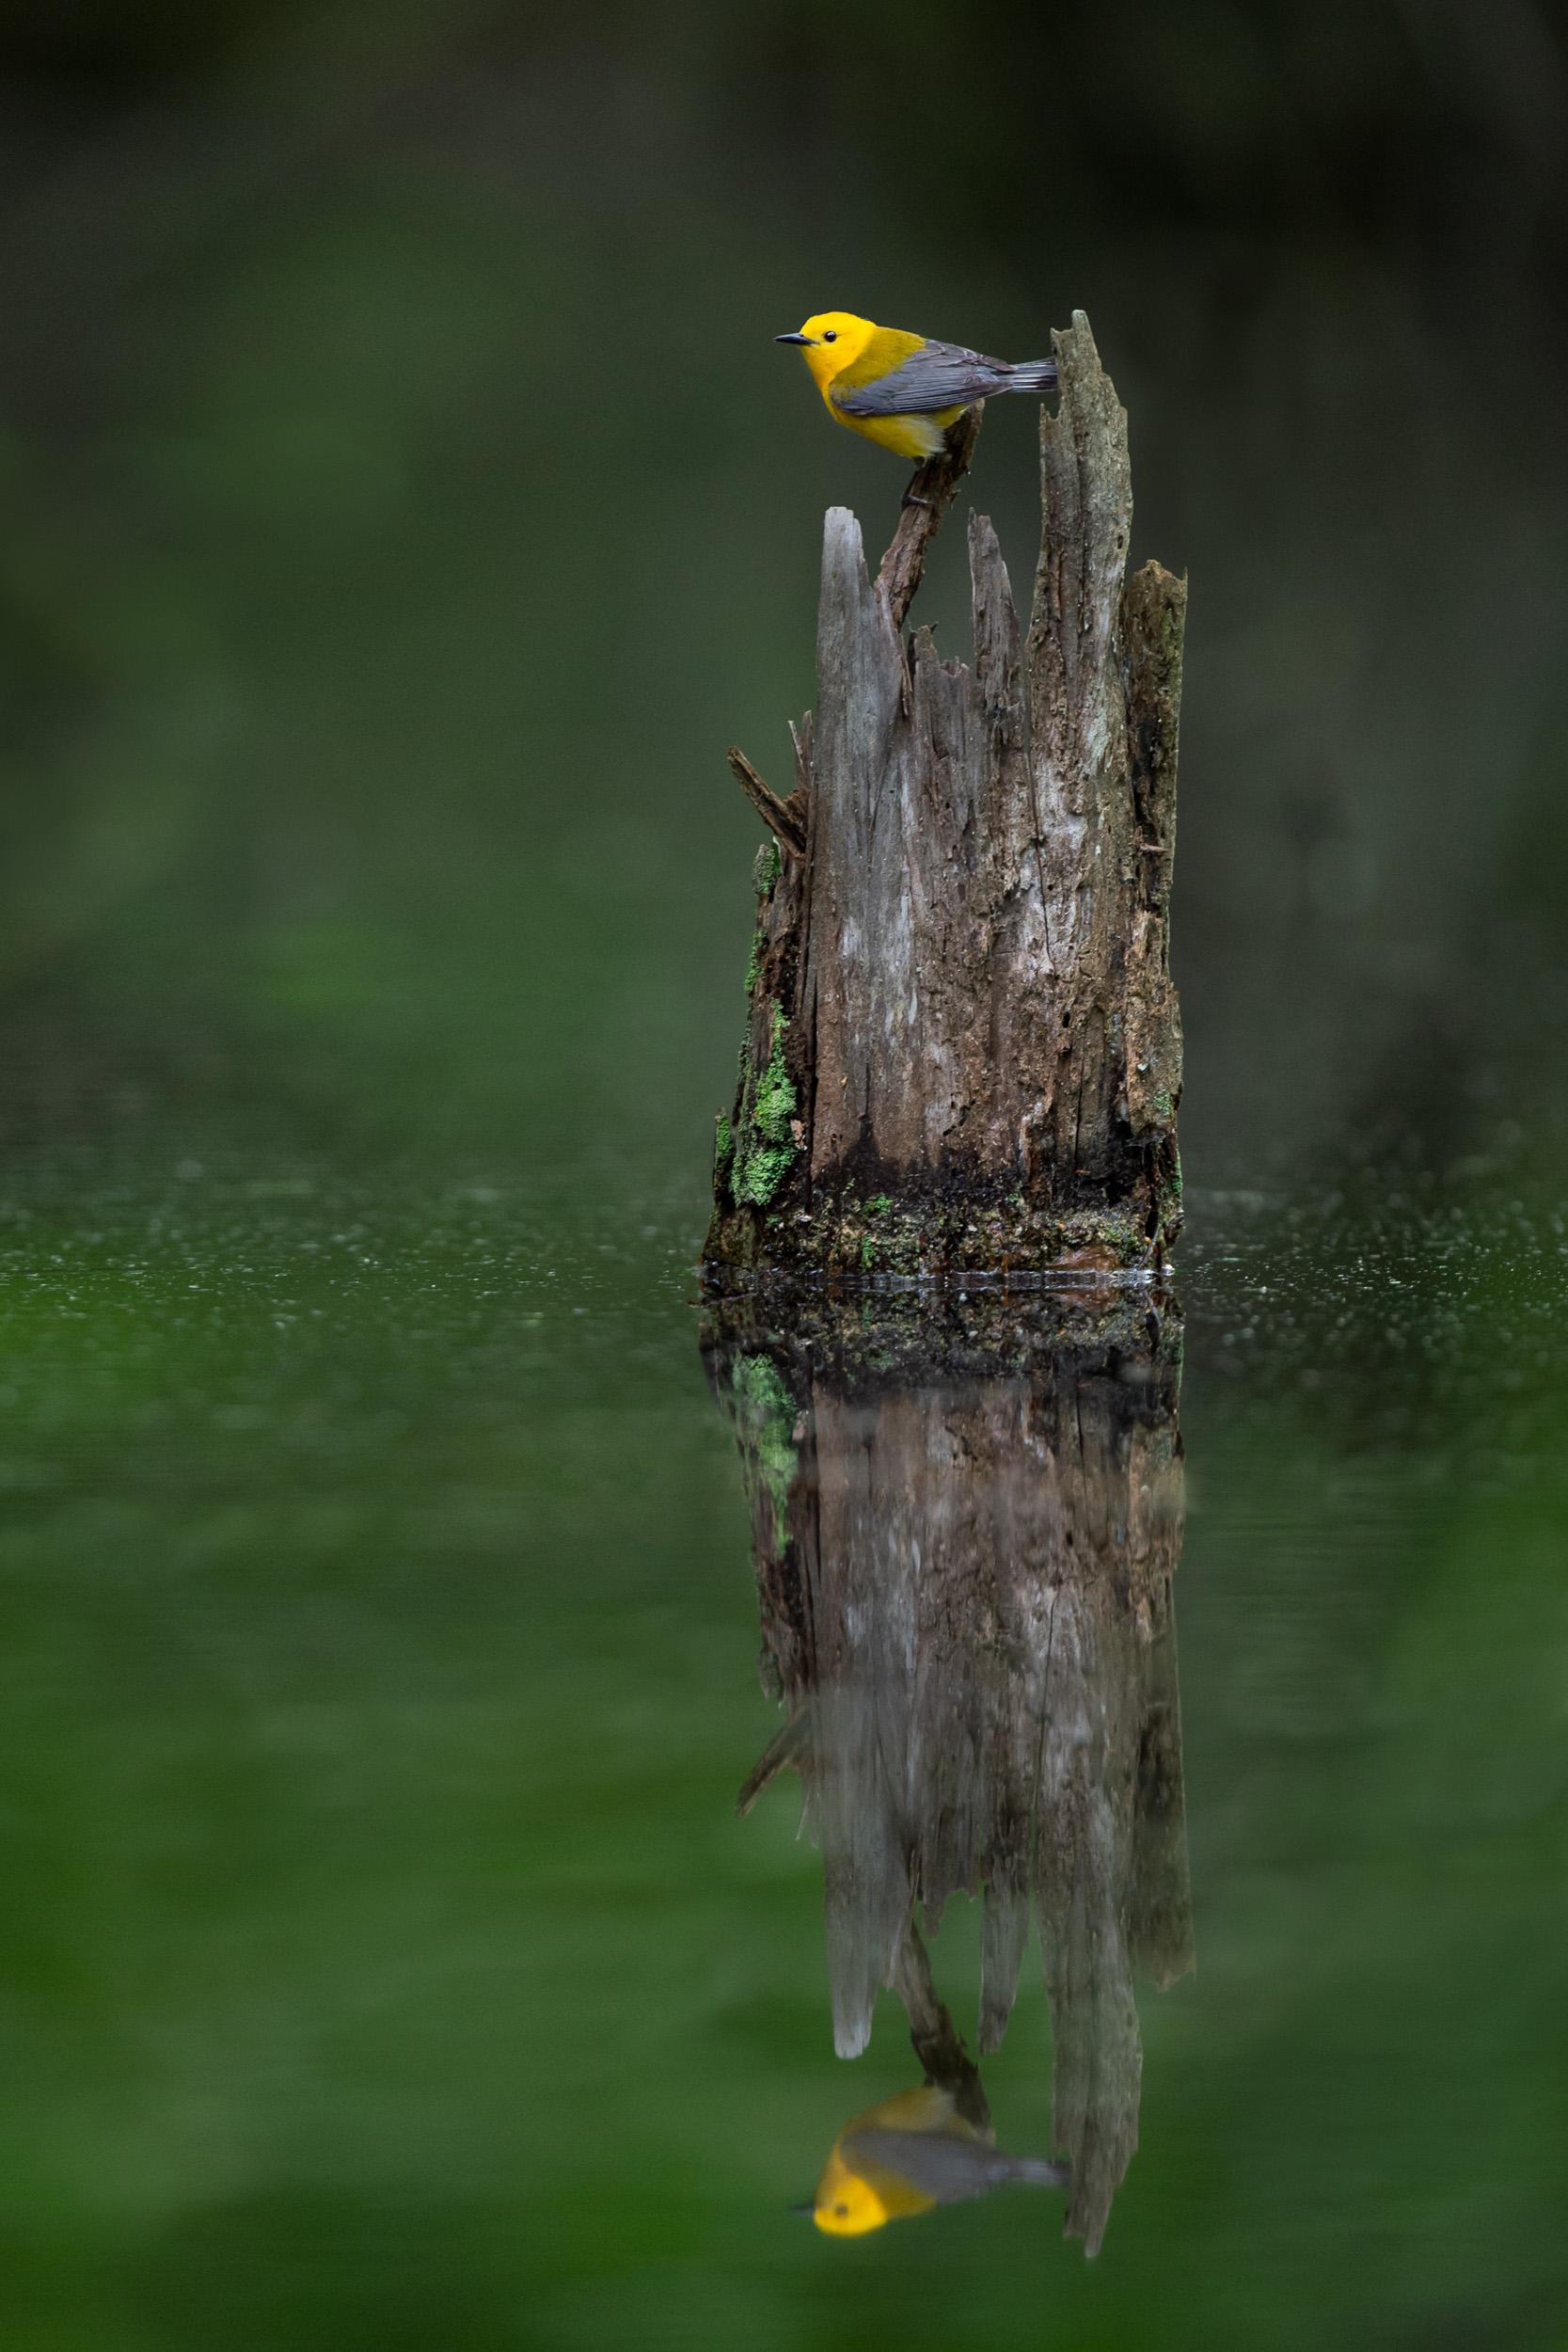 05_The Stump.jpg